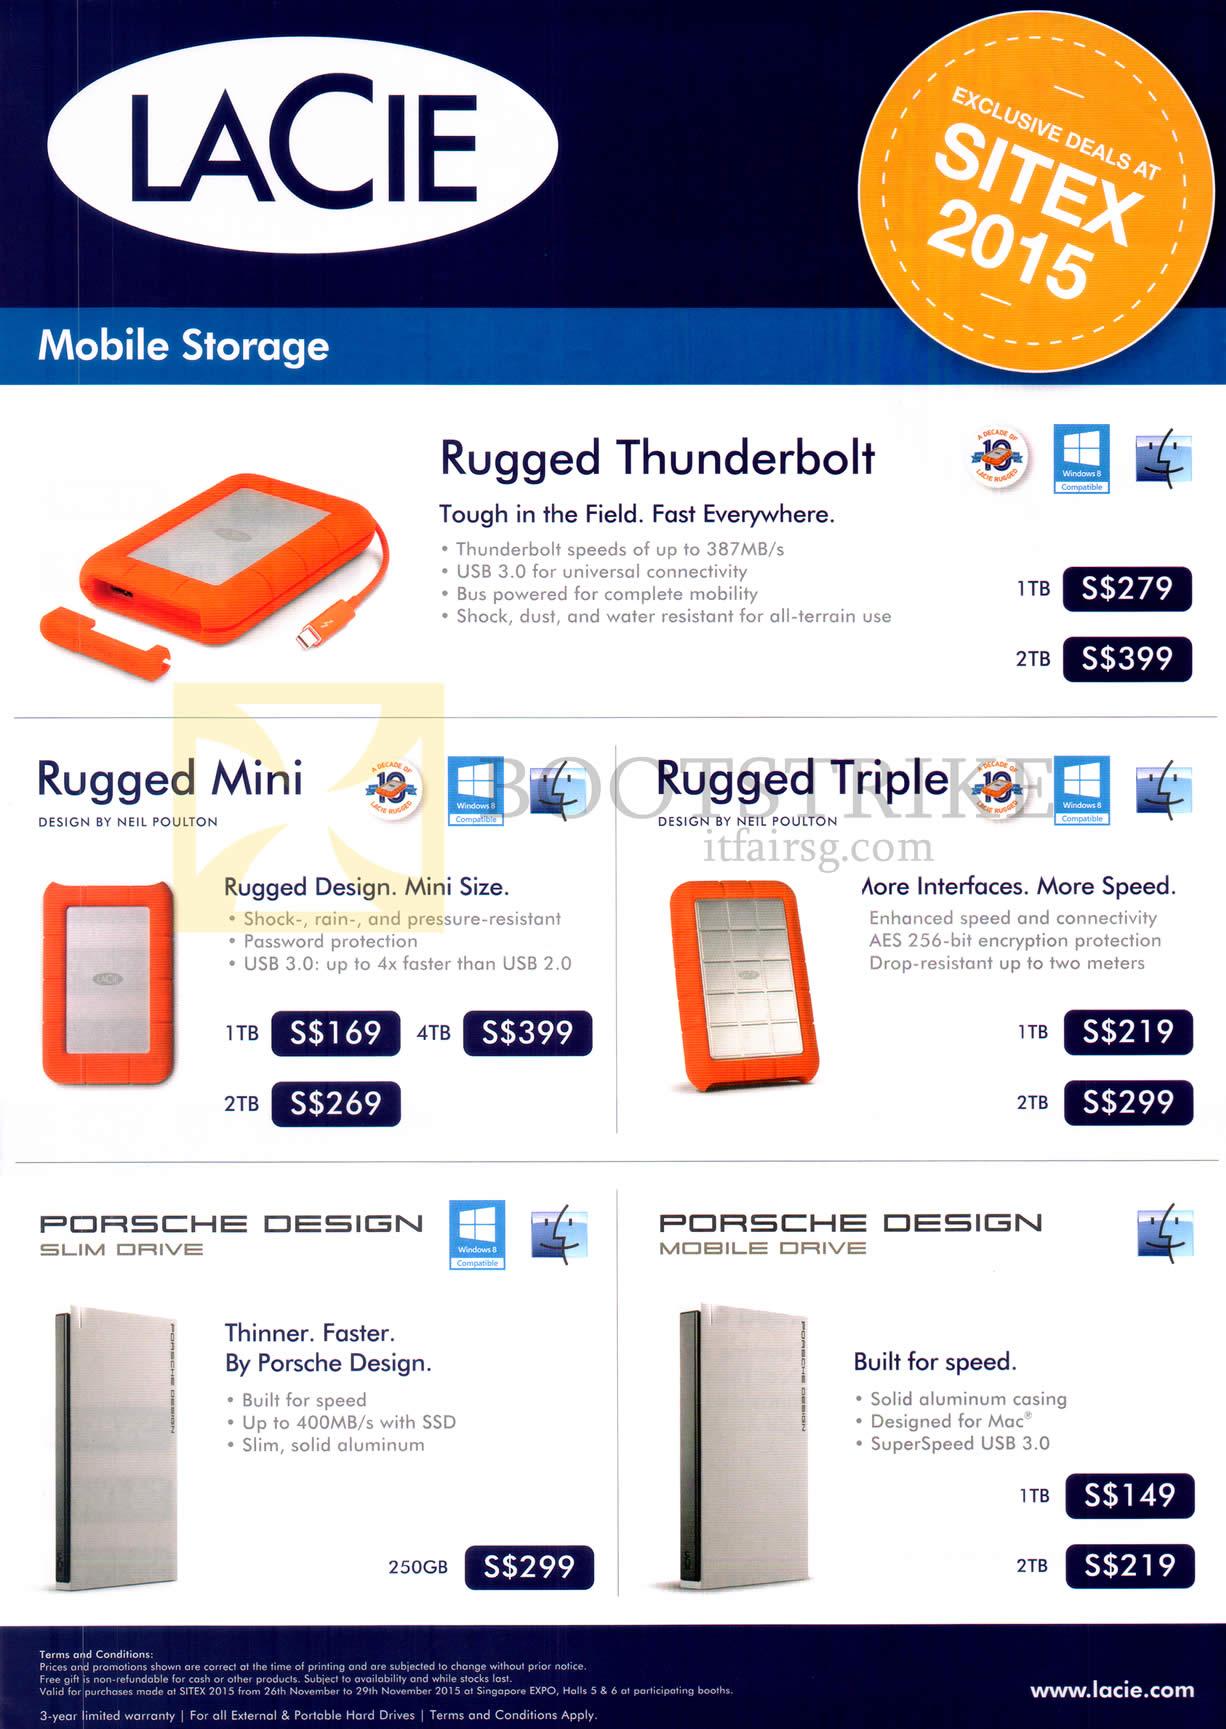 SITEX 2015 price list image brochure of Lacie Mobile Storage Rugged Thunderbolt, Mini, Triple, Porsche Design Slim Drive, Mobile Drive